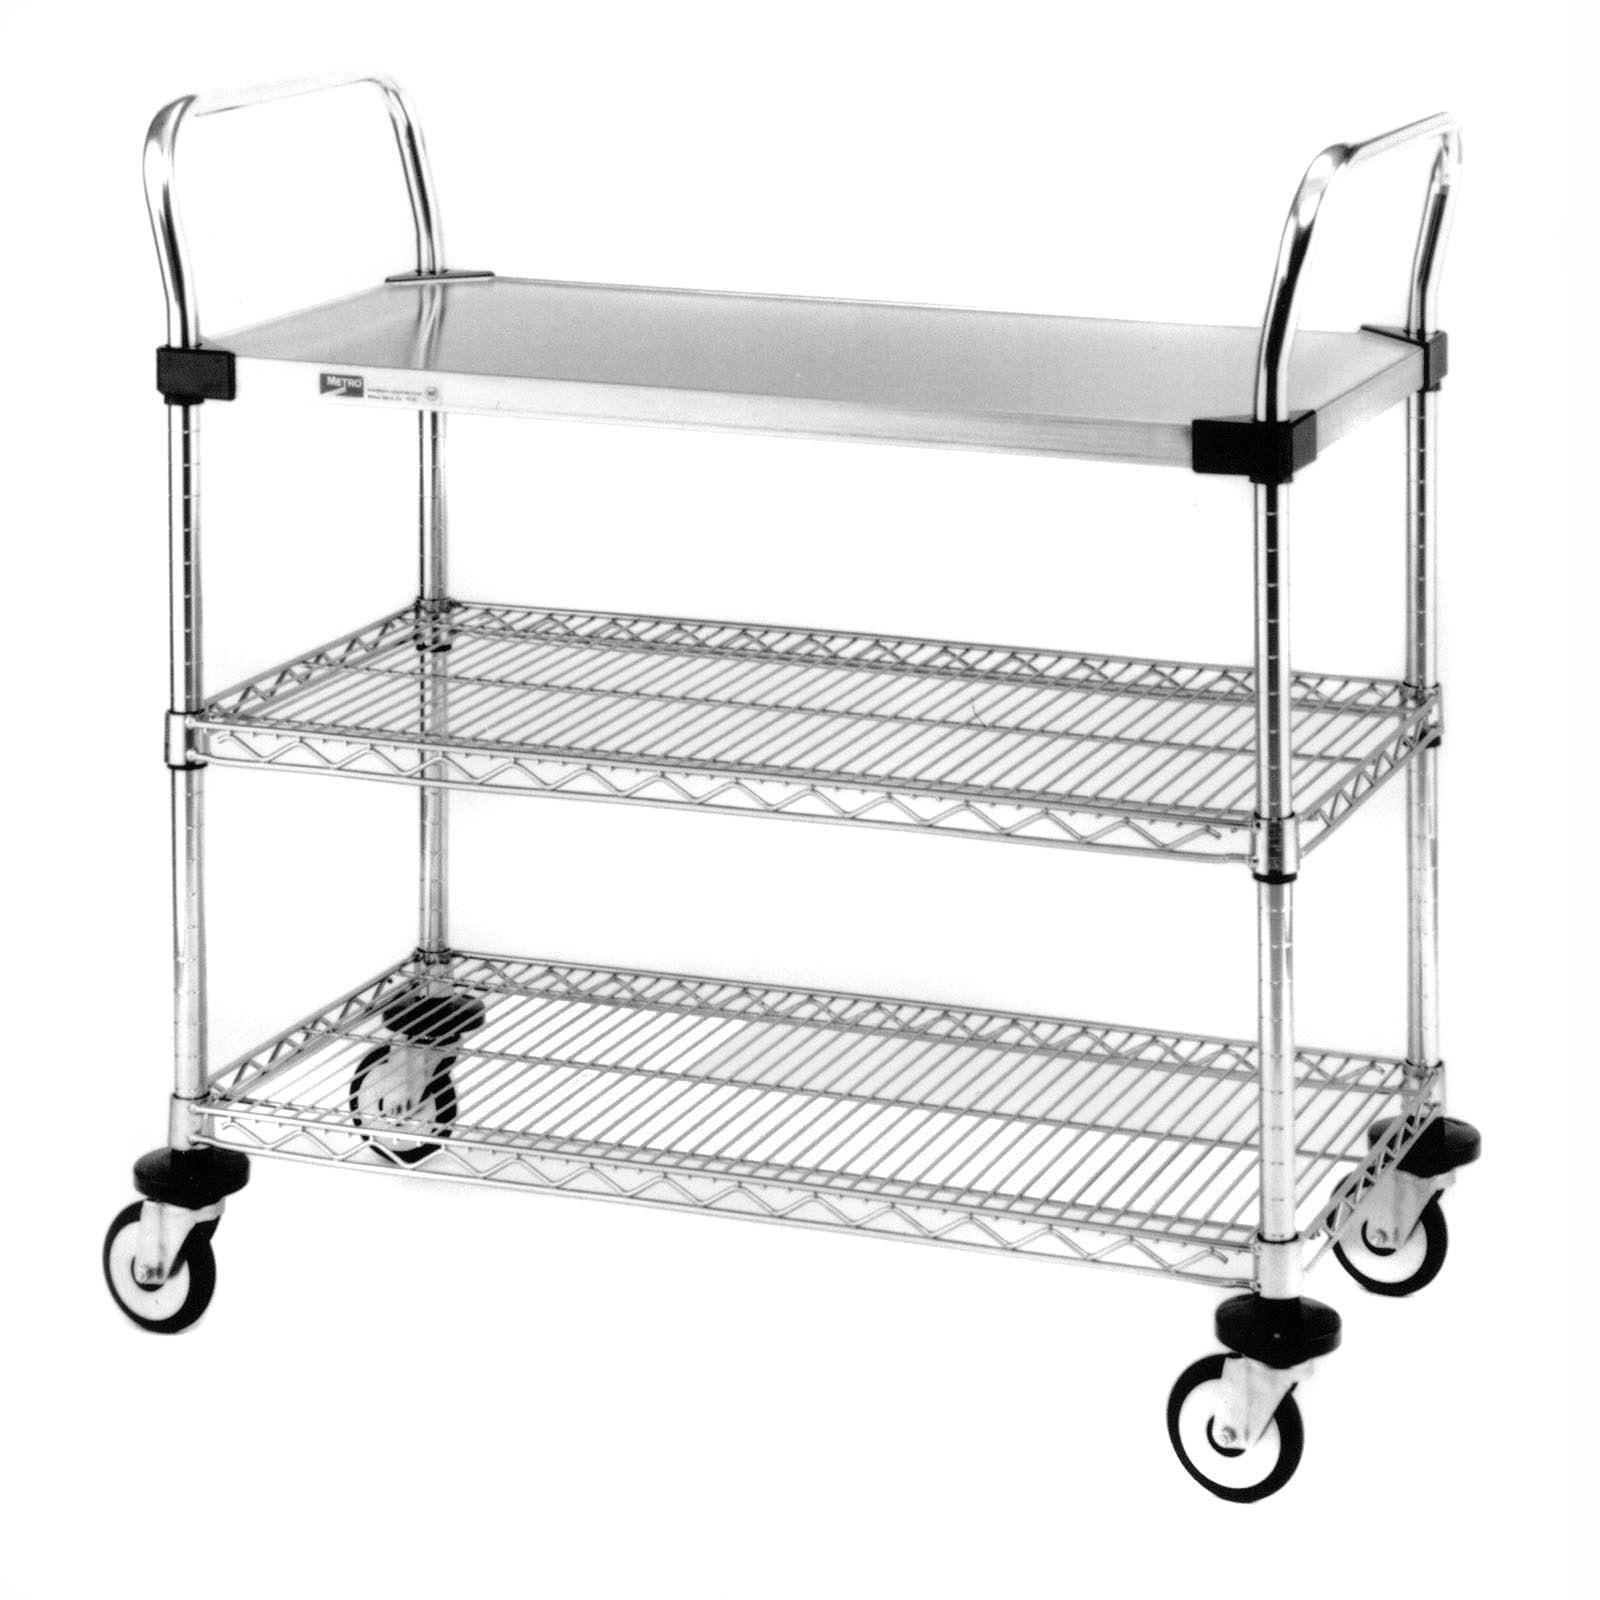 Cart-1 Stainless Shelve 2 Chrome Shelf Serving Cart by InterMetro Industries Corp